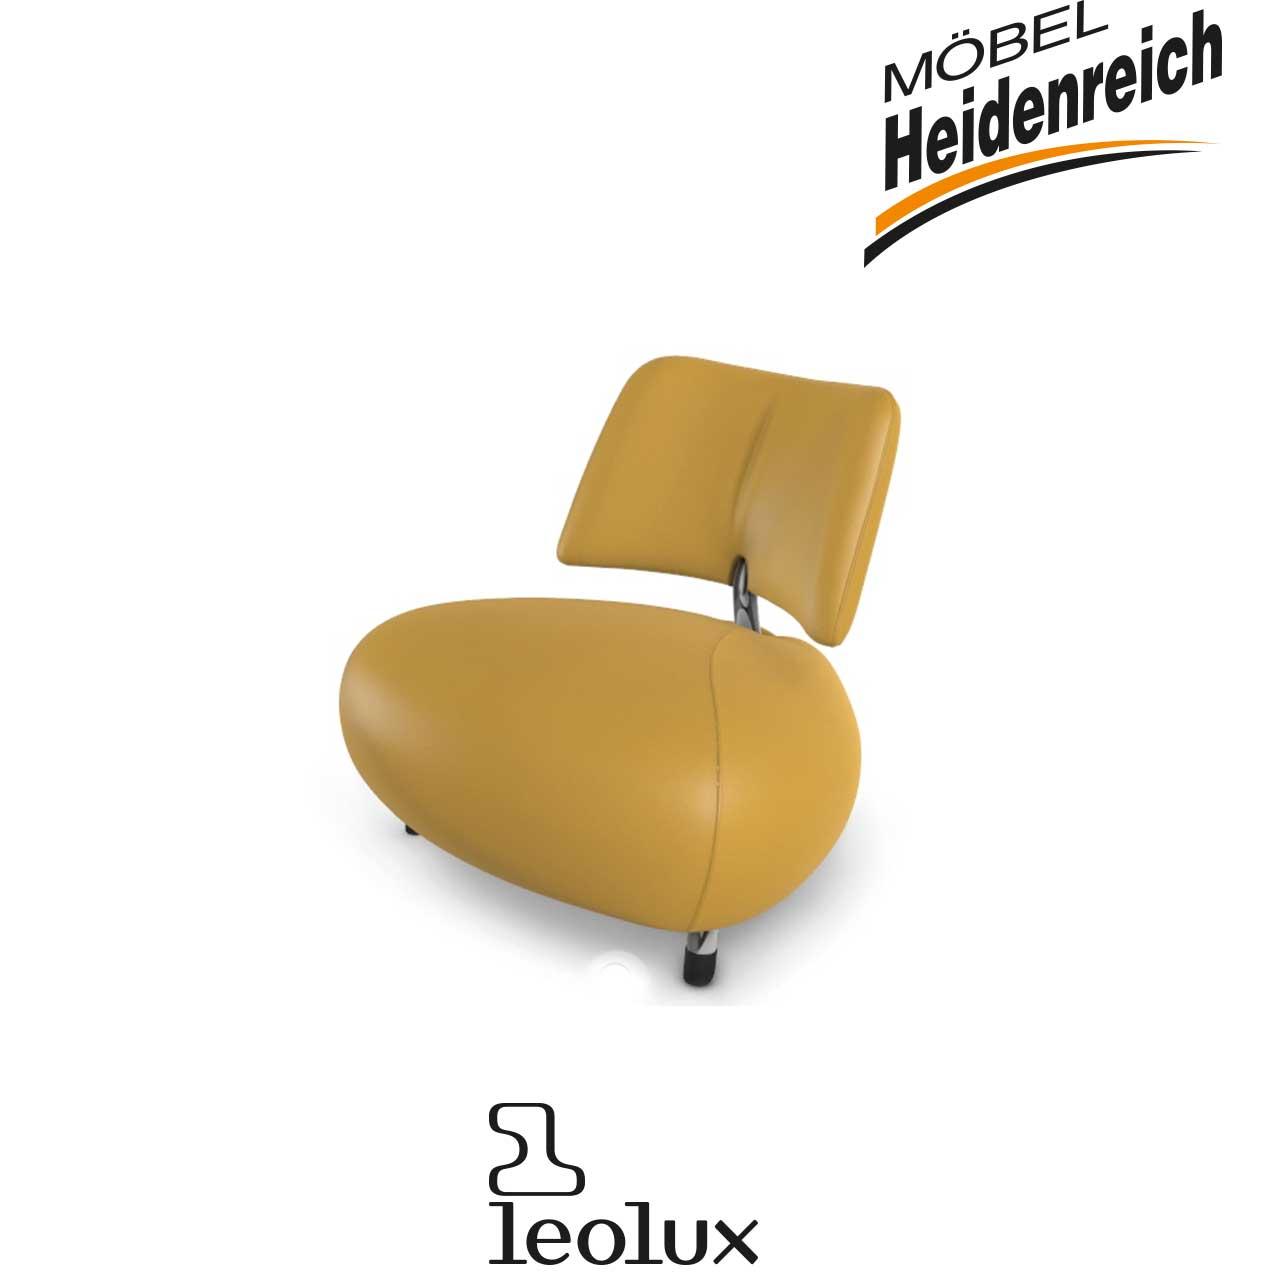 leolux pallone sessel sessel leolux marken m bel heidenreich. Black Bedroom Furniture Sets. Home Design Ideas